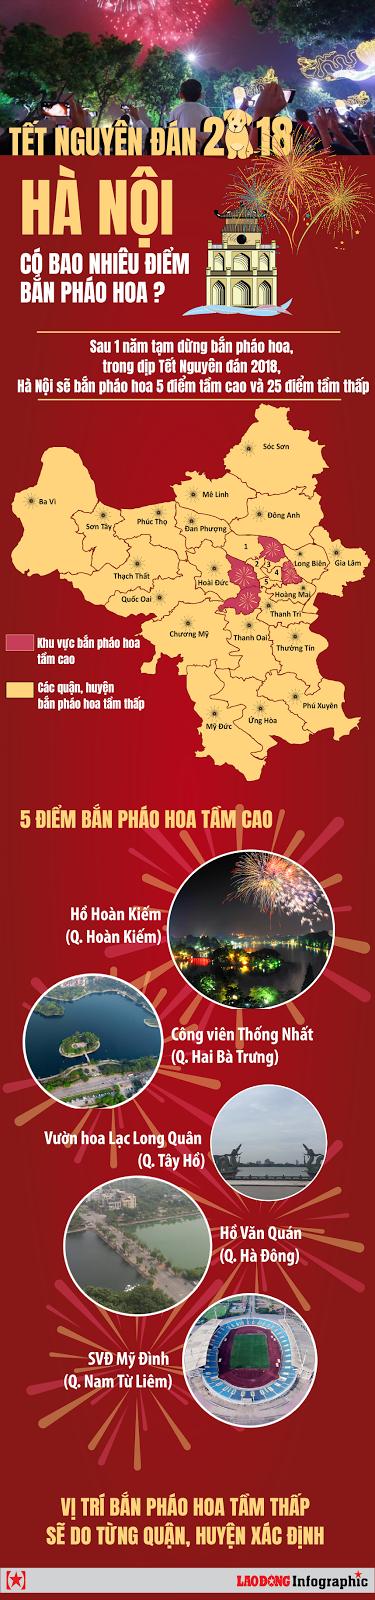 Co-bao-bao-nhieu-dia-diem-ban-phao-hoa-tai-ha-noi-dip-tet-nguyen-dan-2018